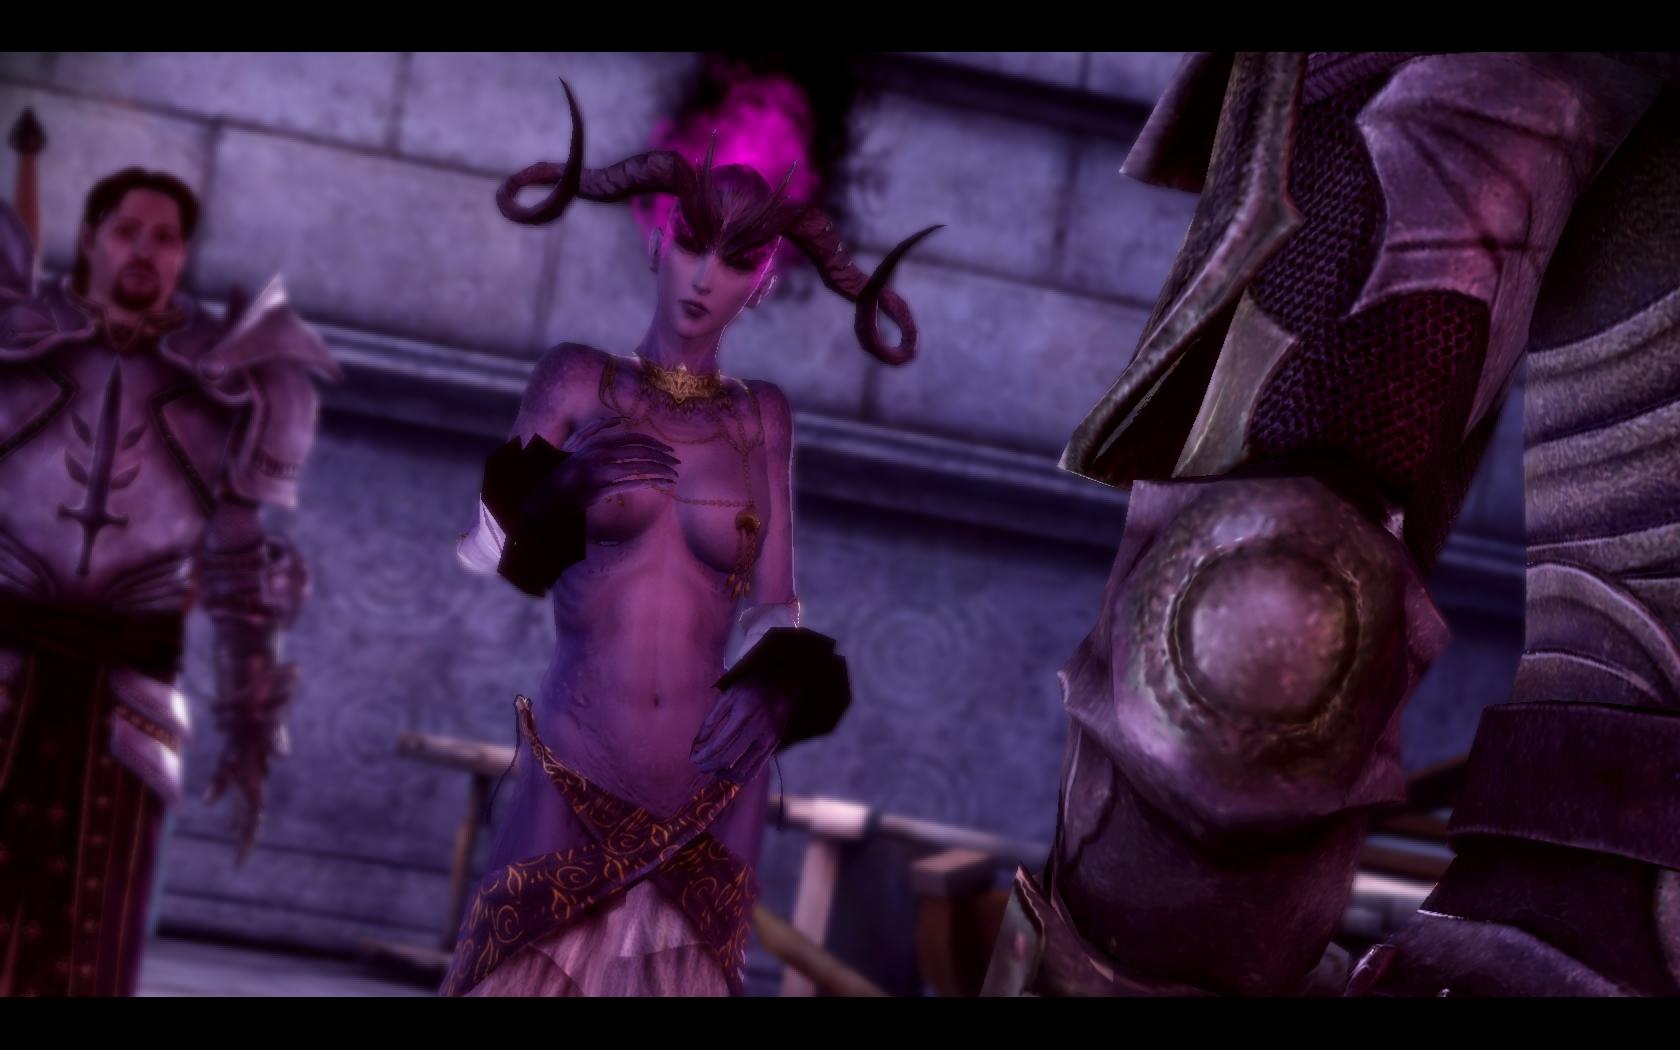 Dragon age origins desire demon pleasure mod porncraft scenes